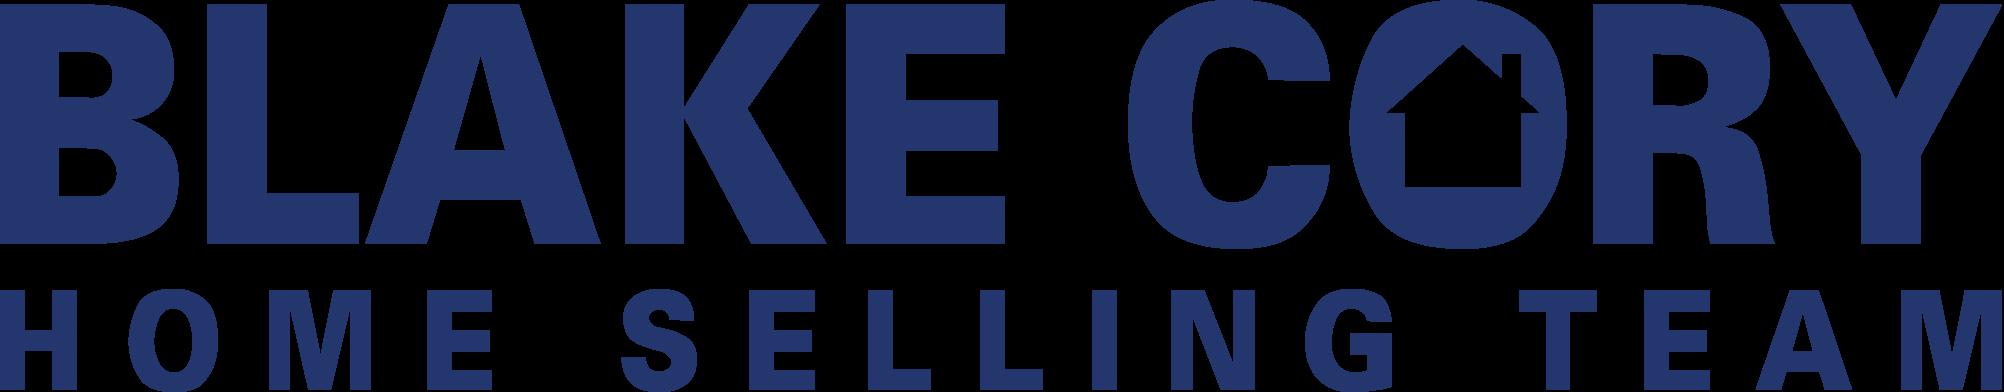 The Blake Cory Homeselling Team logo